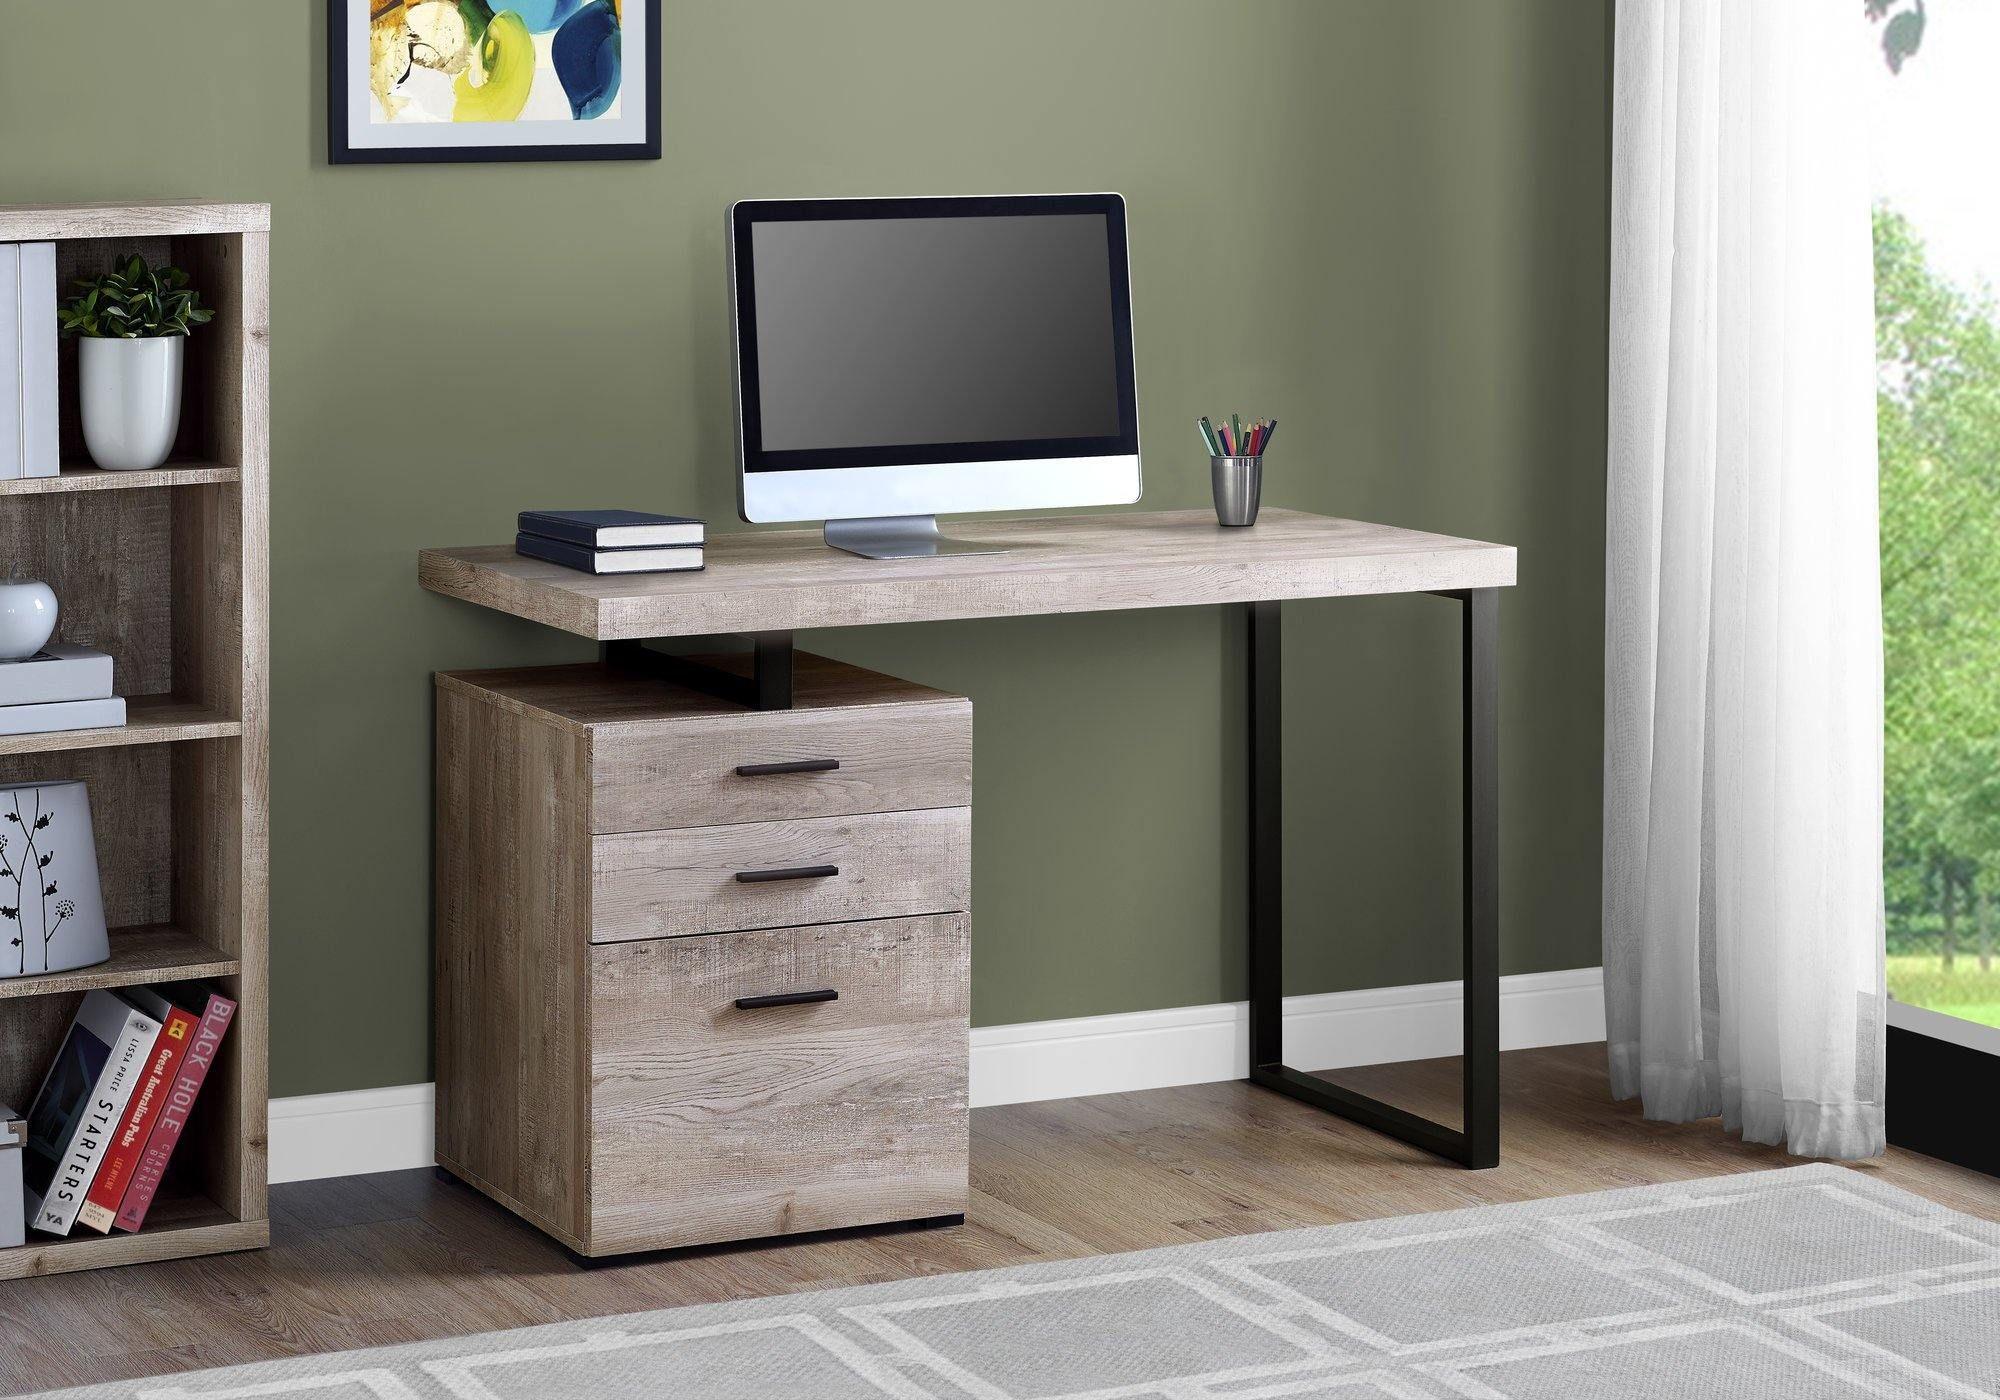 23 75 X 47 25 X 30 Taupe Black Particle Board Hollow Core Metal Computer Desk In 2021 Wood Computer Desk Metal Computer Desk Small Office Desk